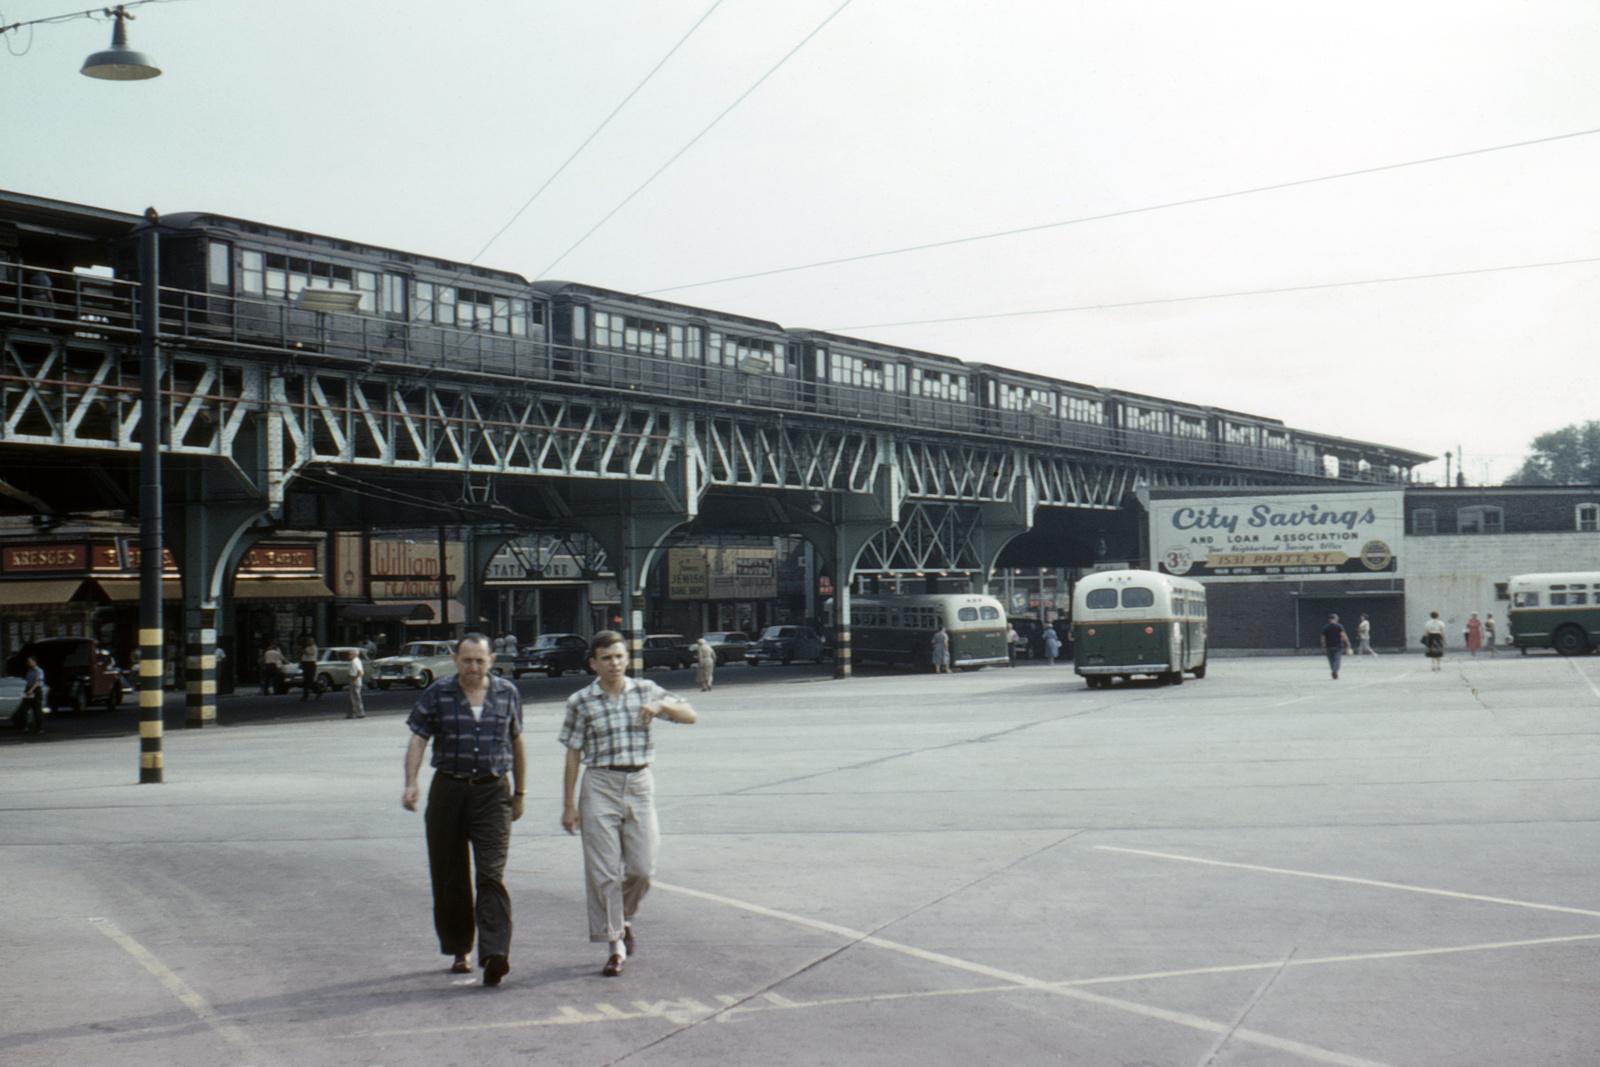 (351k, 1044x704)<br><b>Country:</b> United States<br><b>City:</b> Philadelphia, PA<br><b>System:</b> SEPTA (or Predecessor)<br><b>Line:</b> Market-Frankford El<br><b>Car:</b> PTC/SEPTA M-1 (Pressed Steel/Brill, 1906-1913)   <br><b>Photo by:</b> Ed Davis, Sr.<br><b>Collection of:</b> David Pirmann<br><b>Date:</b> 8/1959<br><b>Viewed (this week/total):</b> 0 / 3942